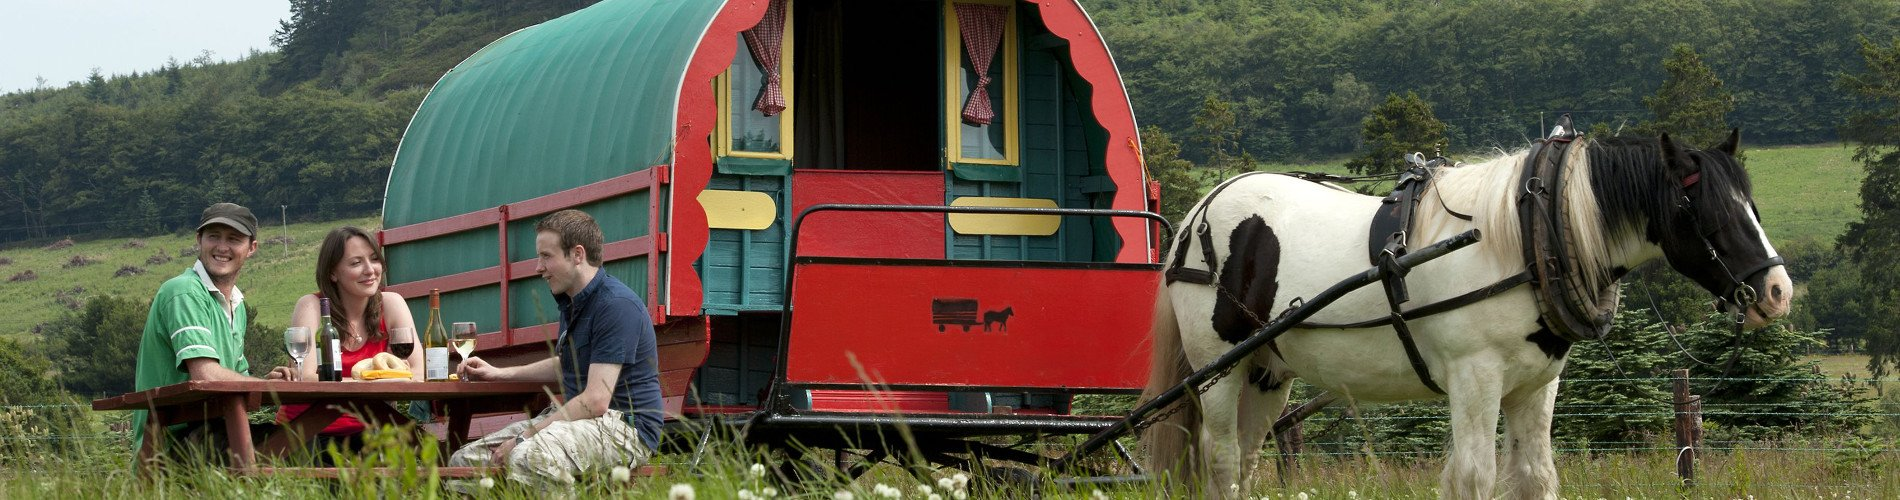 Clissmann-Horse-Caravans-picnic-lunch-Ireland